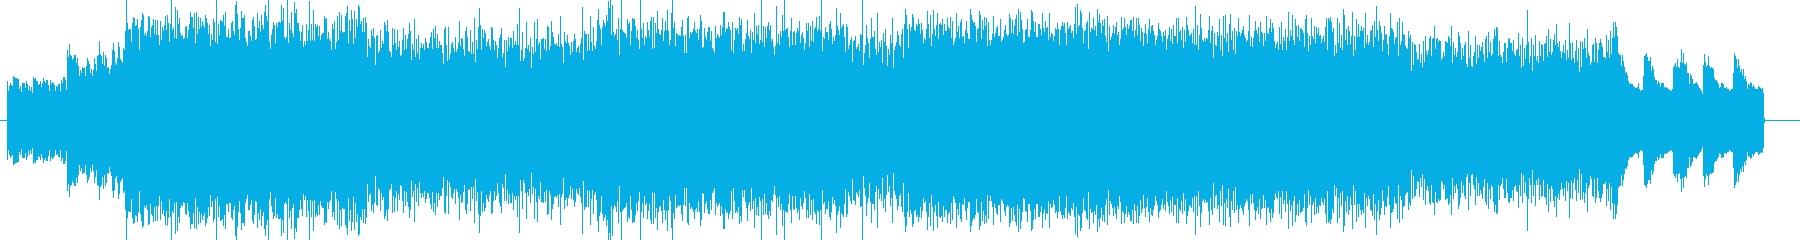 「HR/HM」「DARK系」BGM22の再生済みの波形